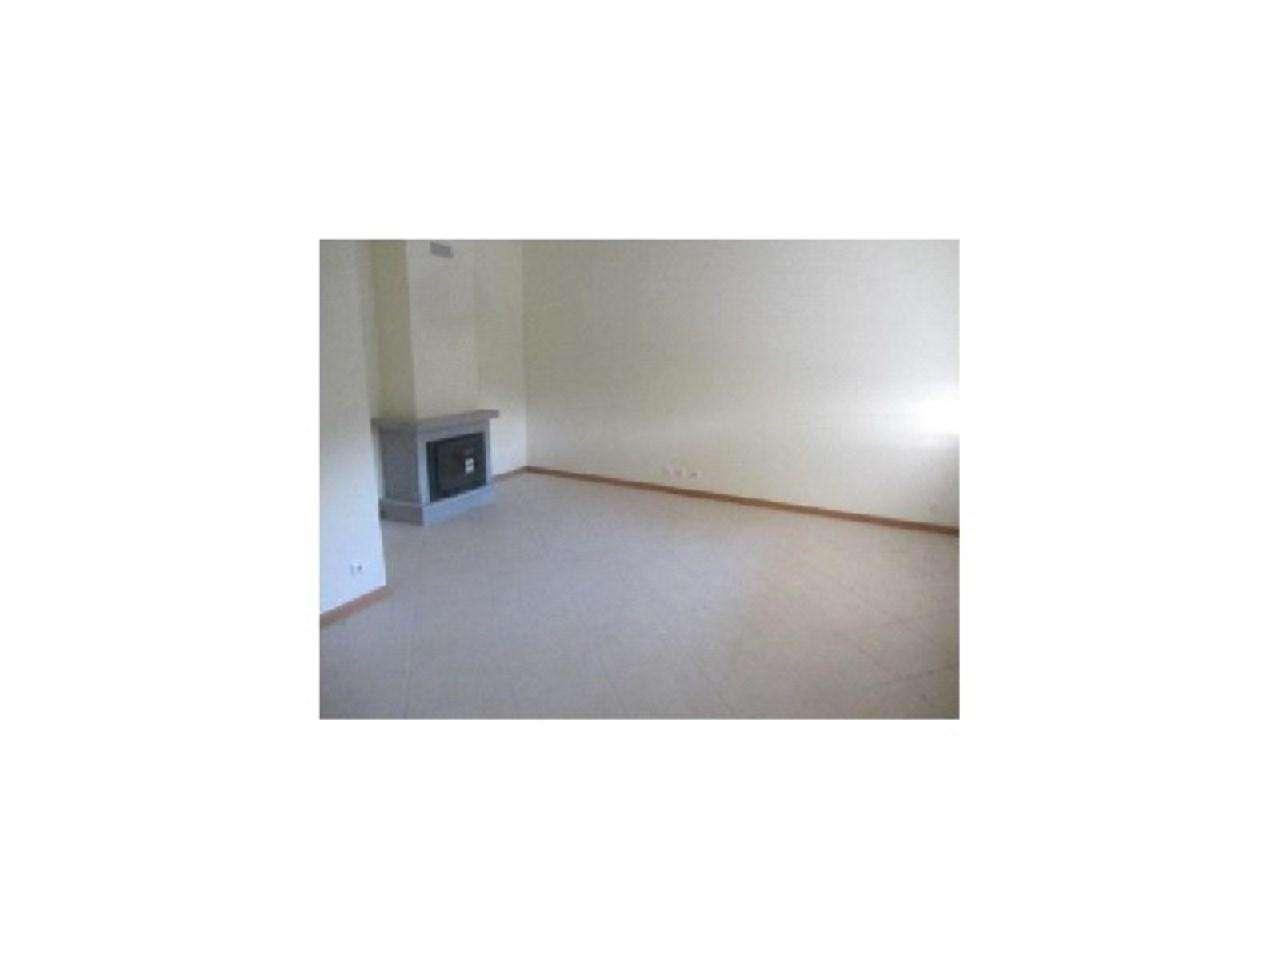 Apartamento para comprar, Caria, Belmonte, Castelo Branco - Foto 1